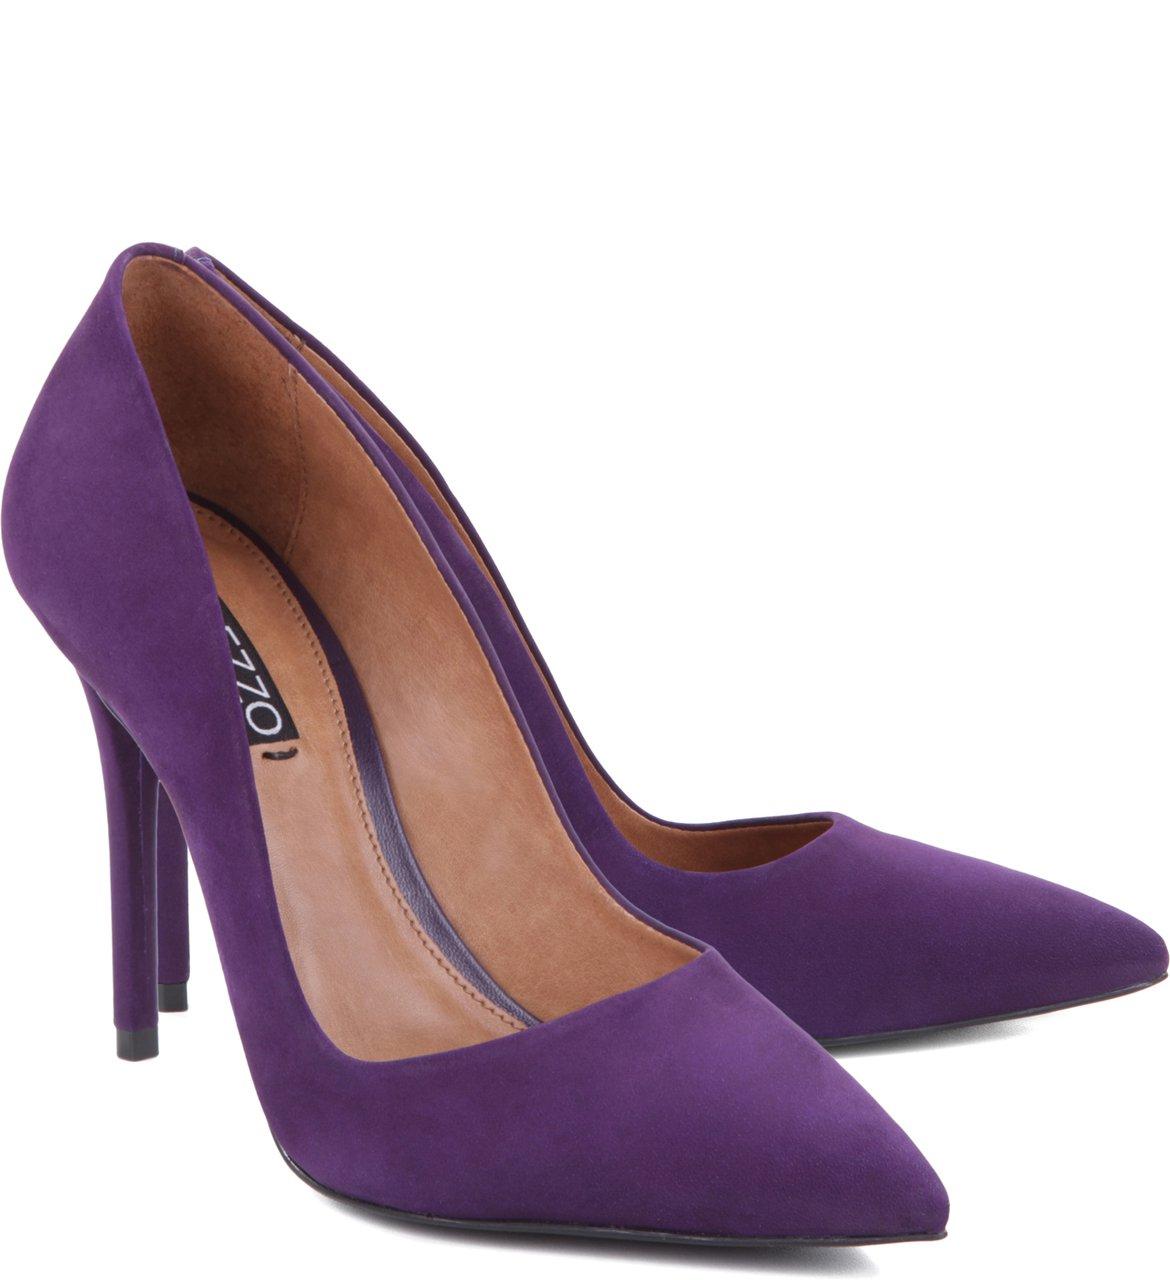 5f6339f070 Scarpin Nobuck Violeta